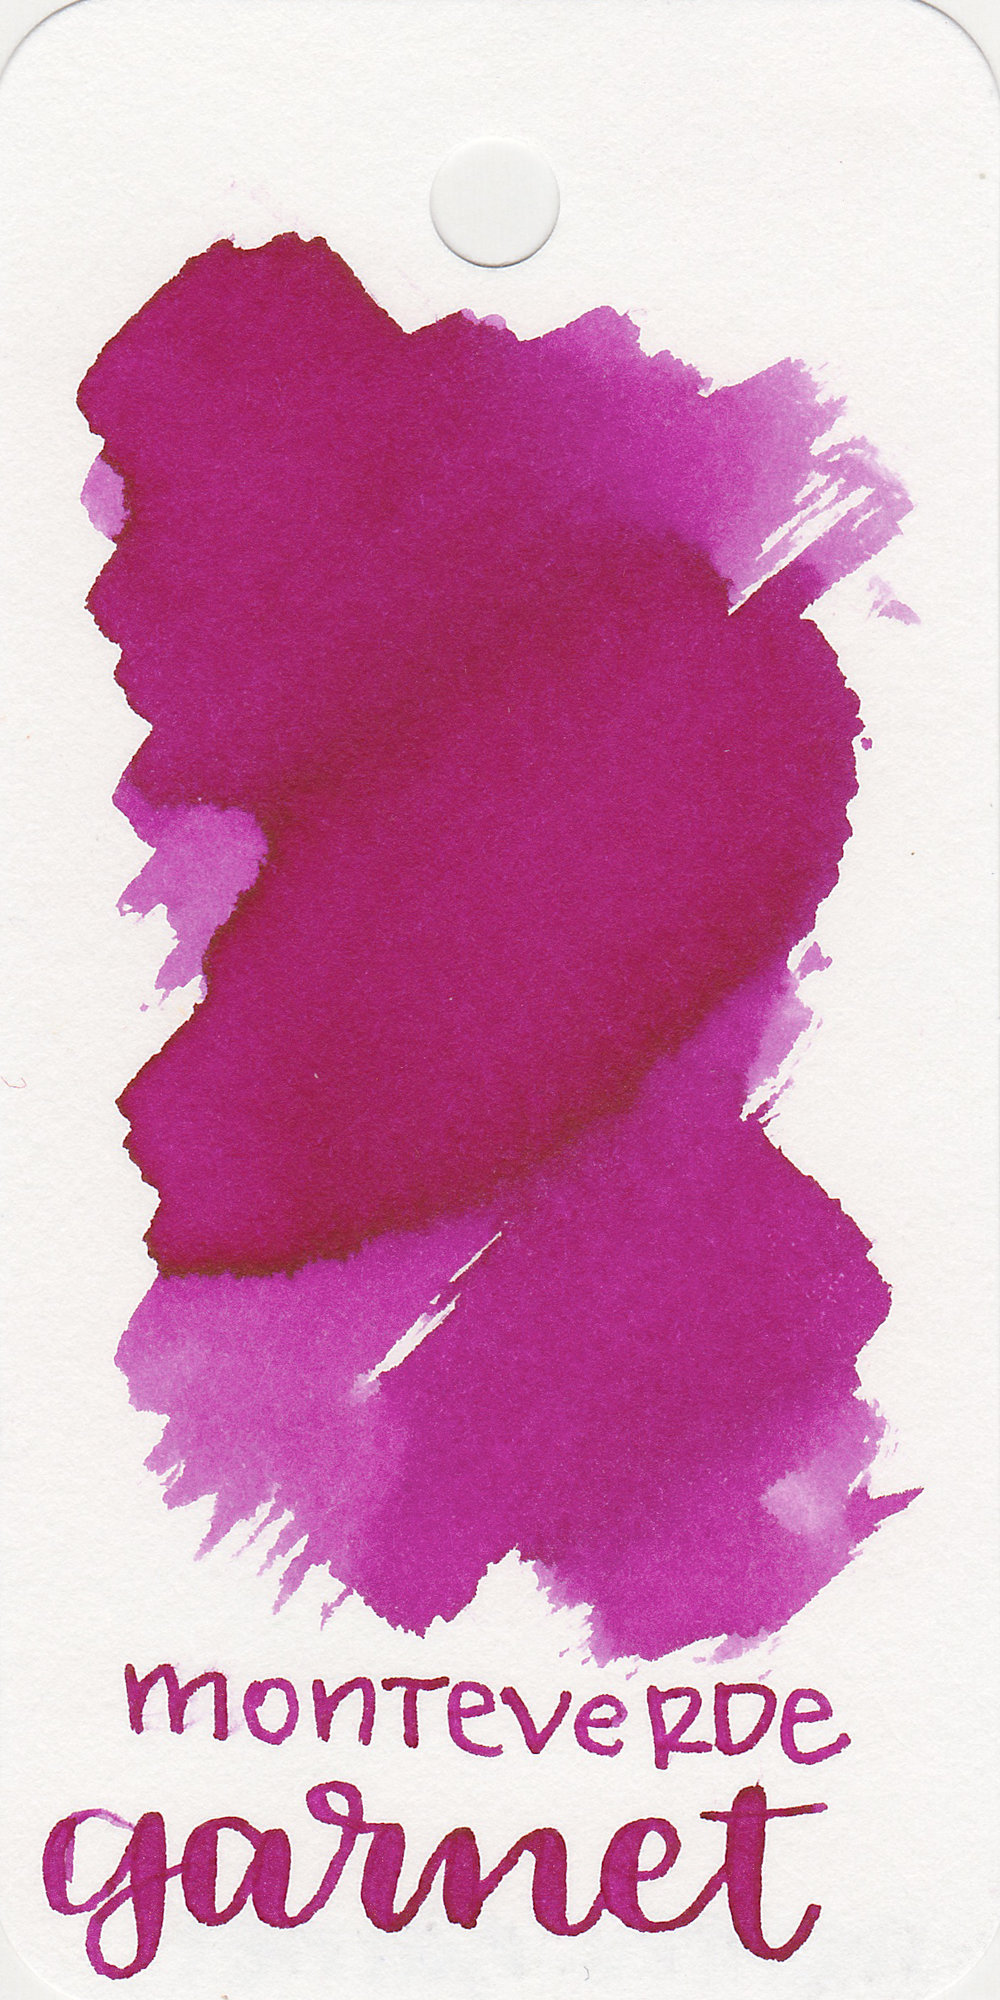 The color: - Garnet is a bright magenta.